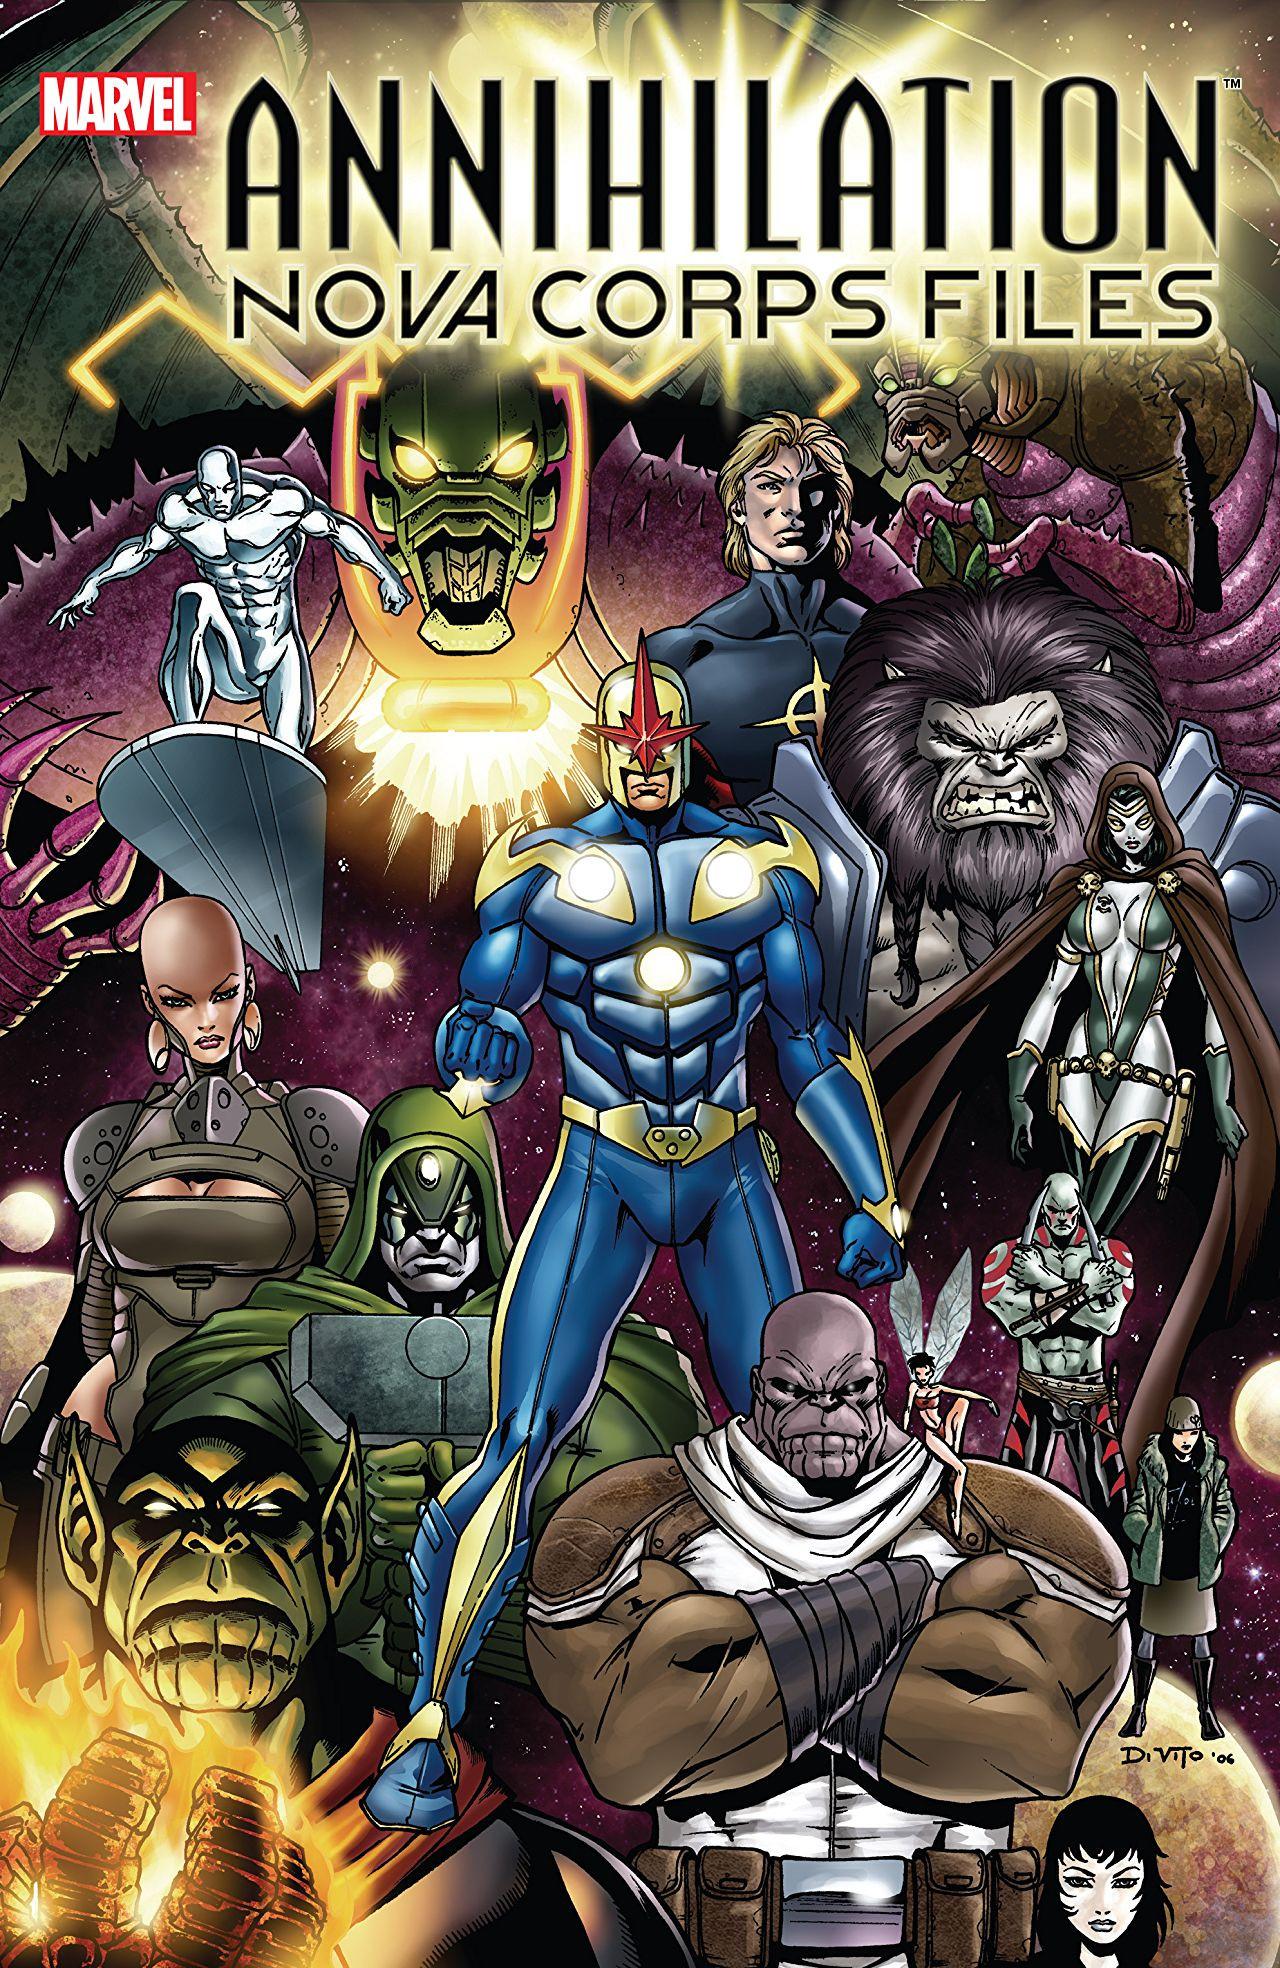 Annihilation: The Nova Corps Files Vol 1 1